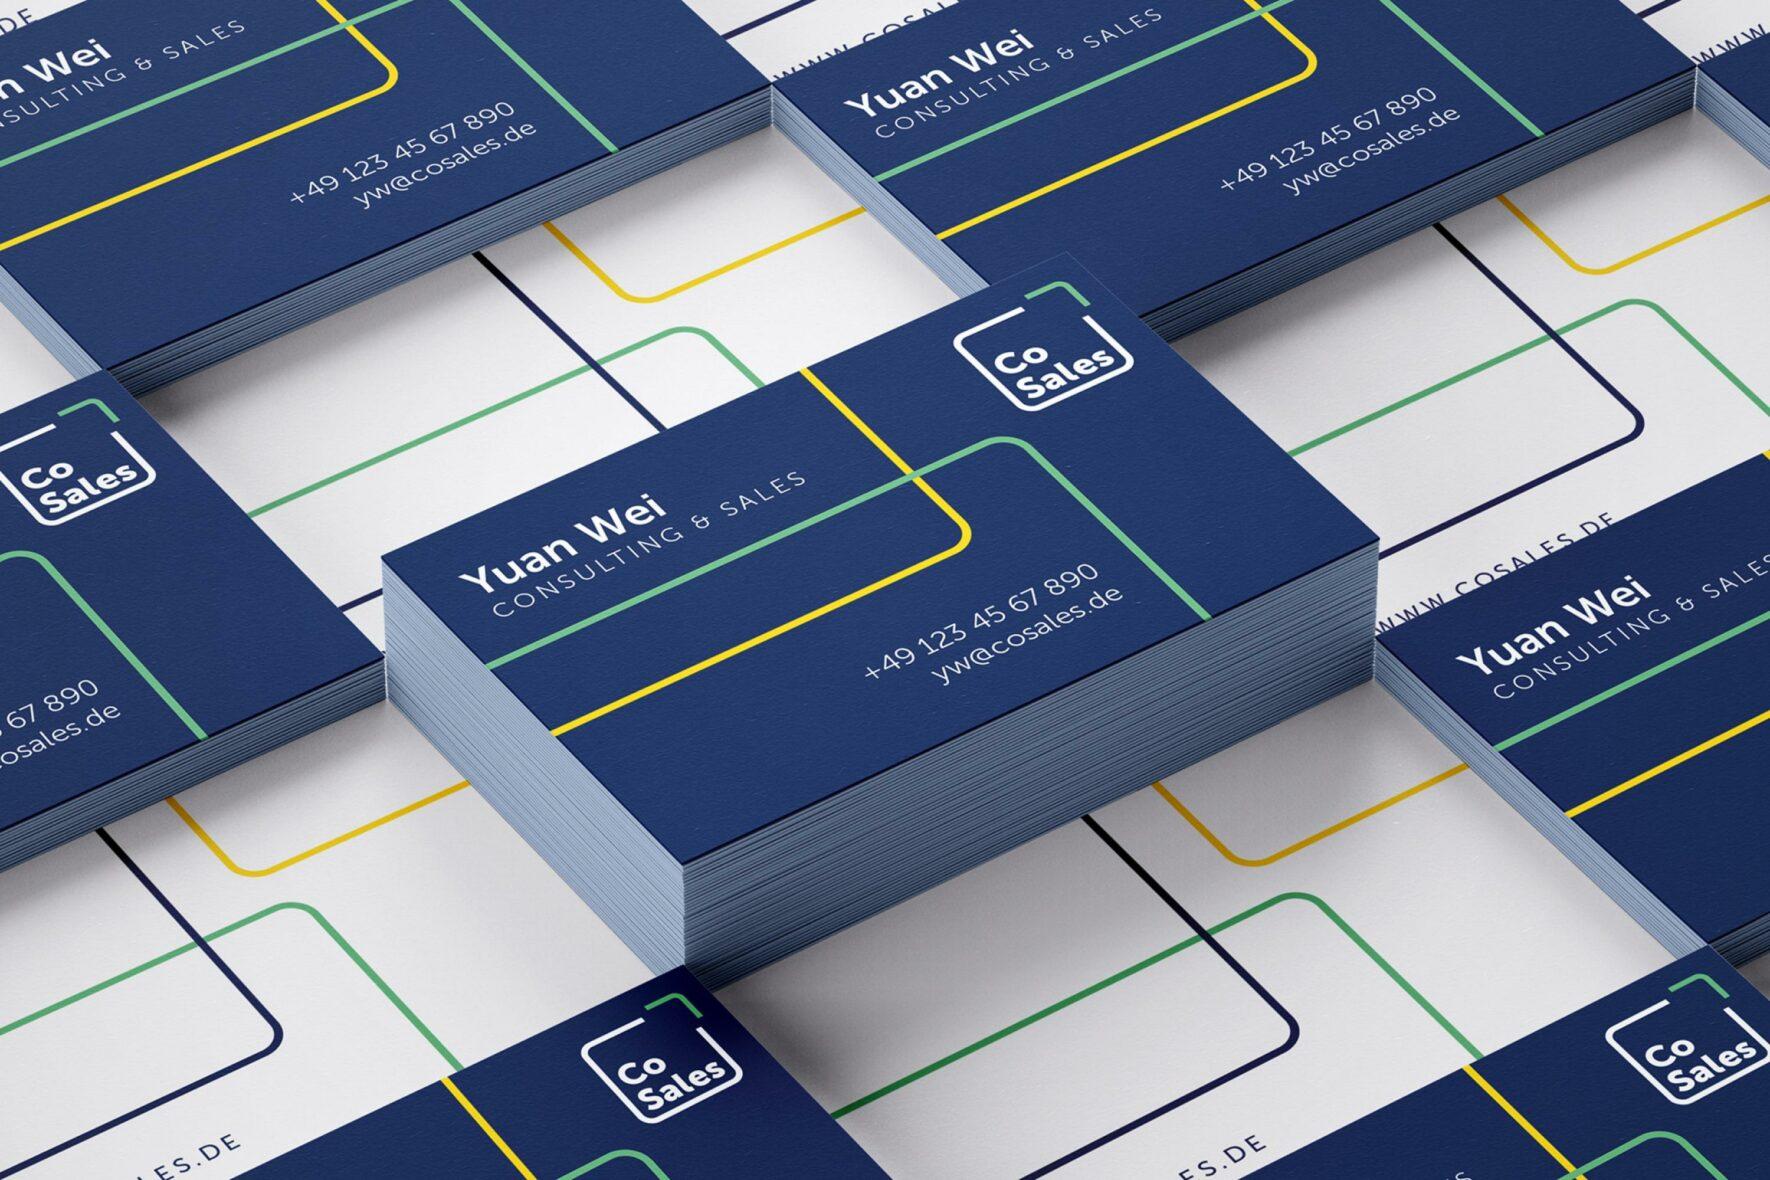 CoSales-Visitenkarten-Gestaltung-Corporate-Design-Print-FORMLOS-Berlin-4